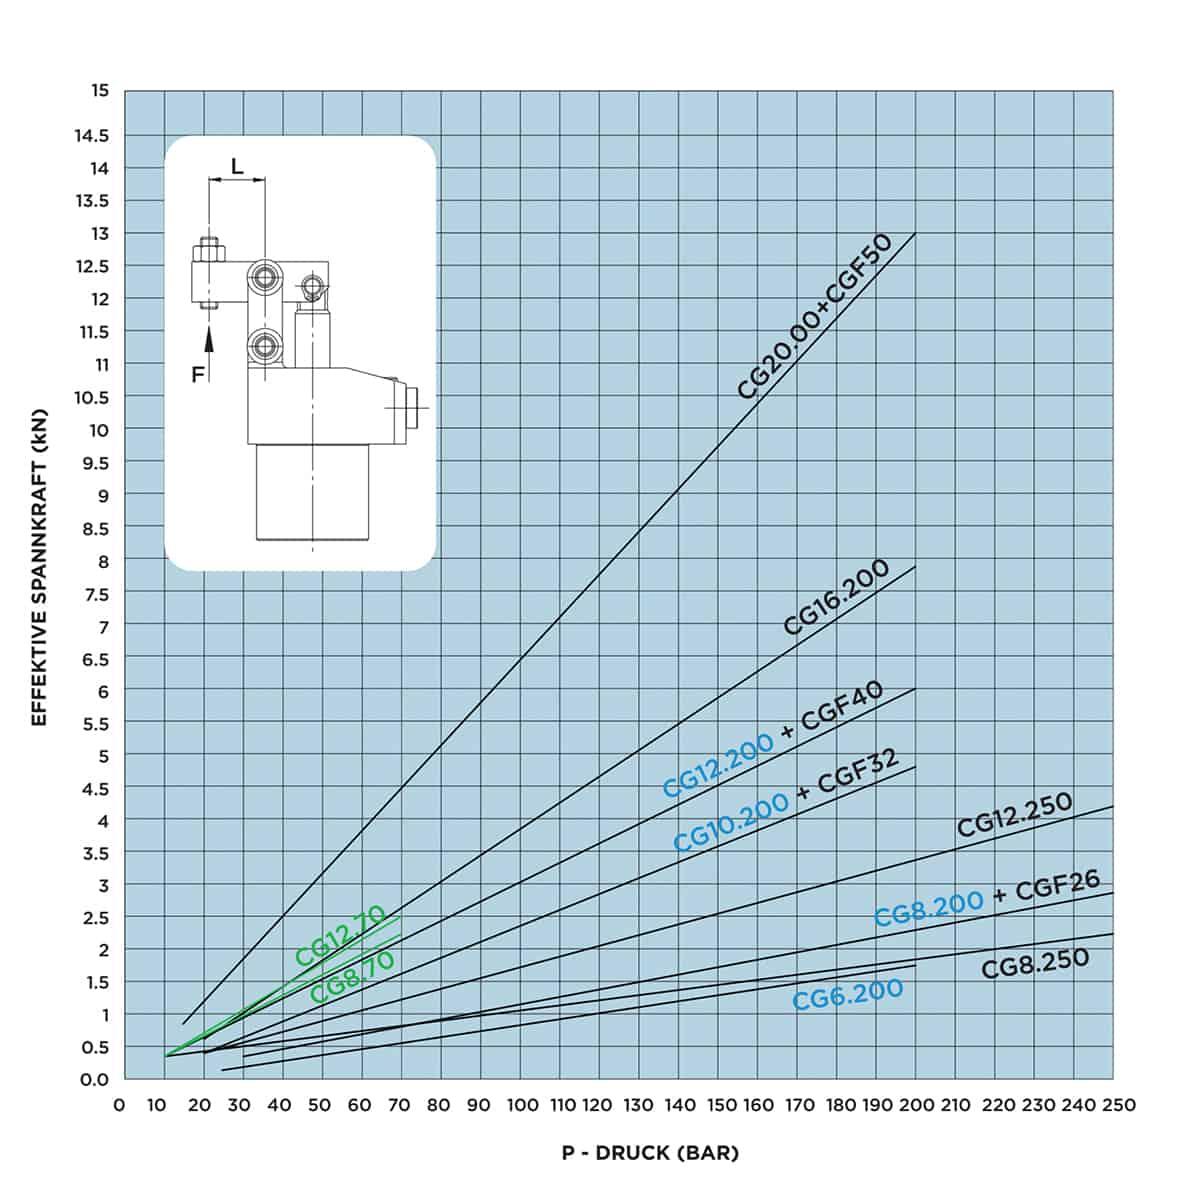 4.0. Diagramm fuer Hebelspanner